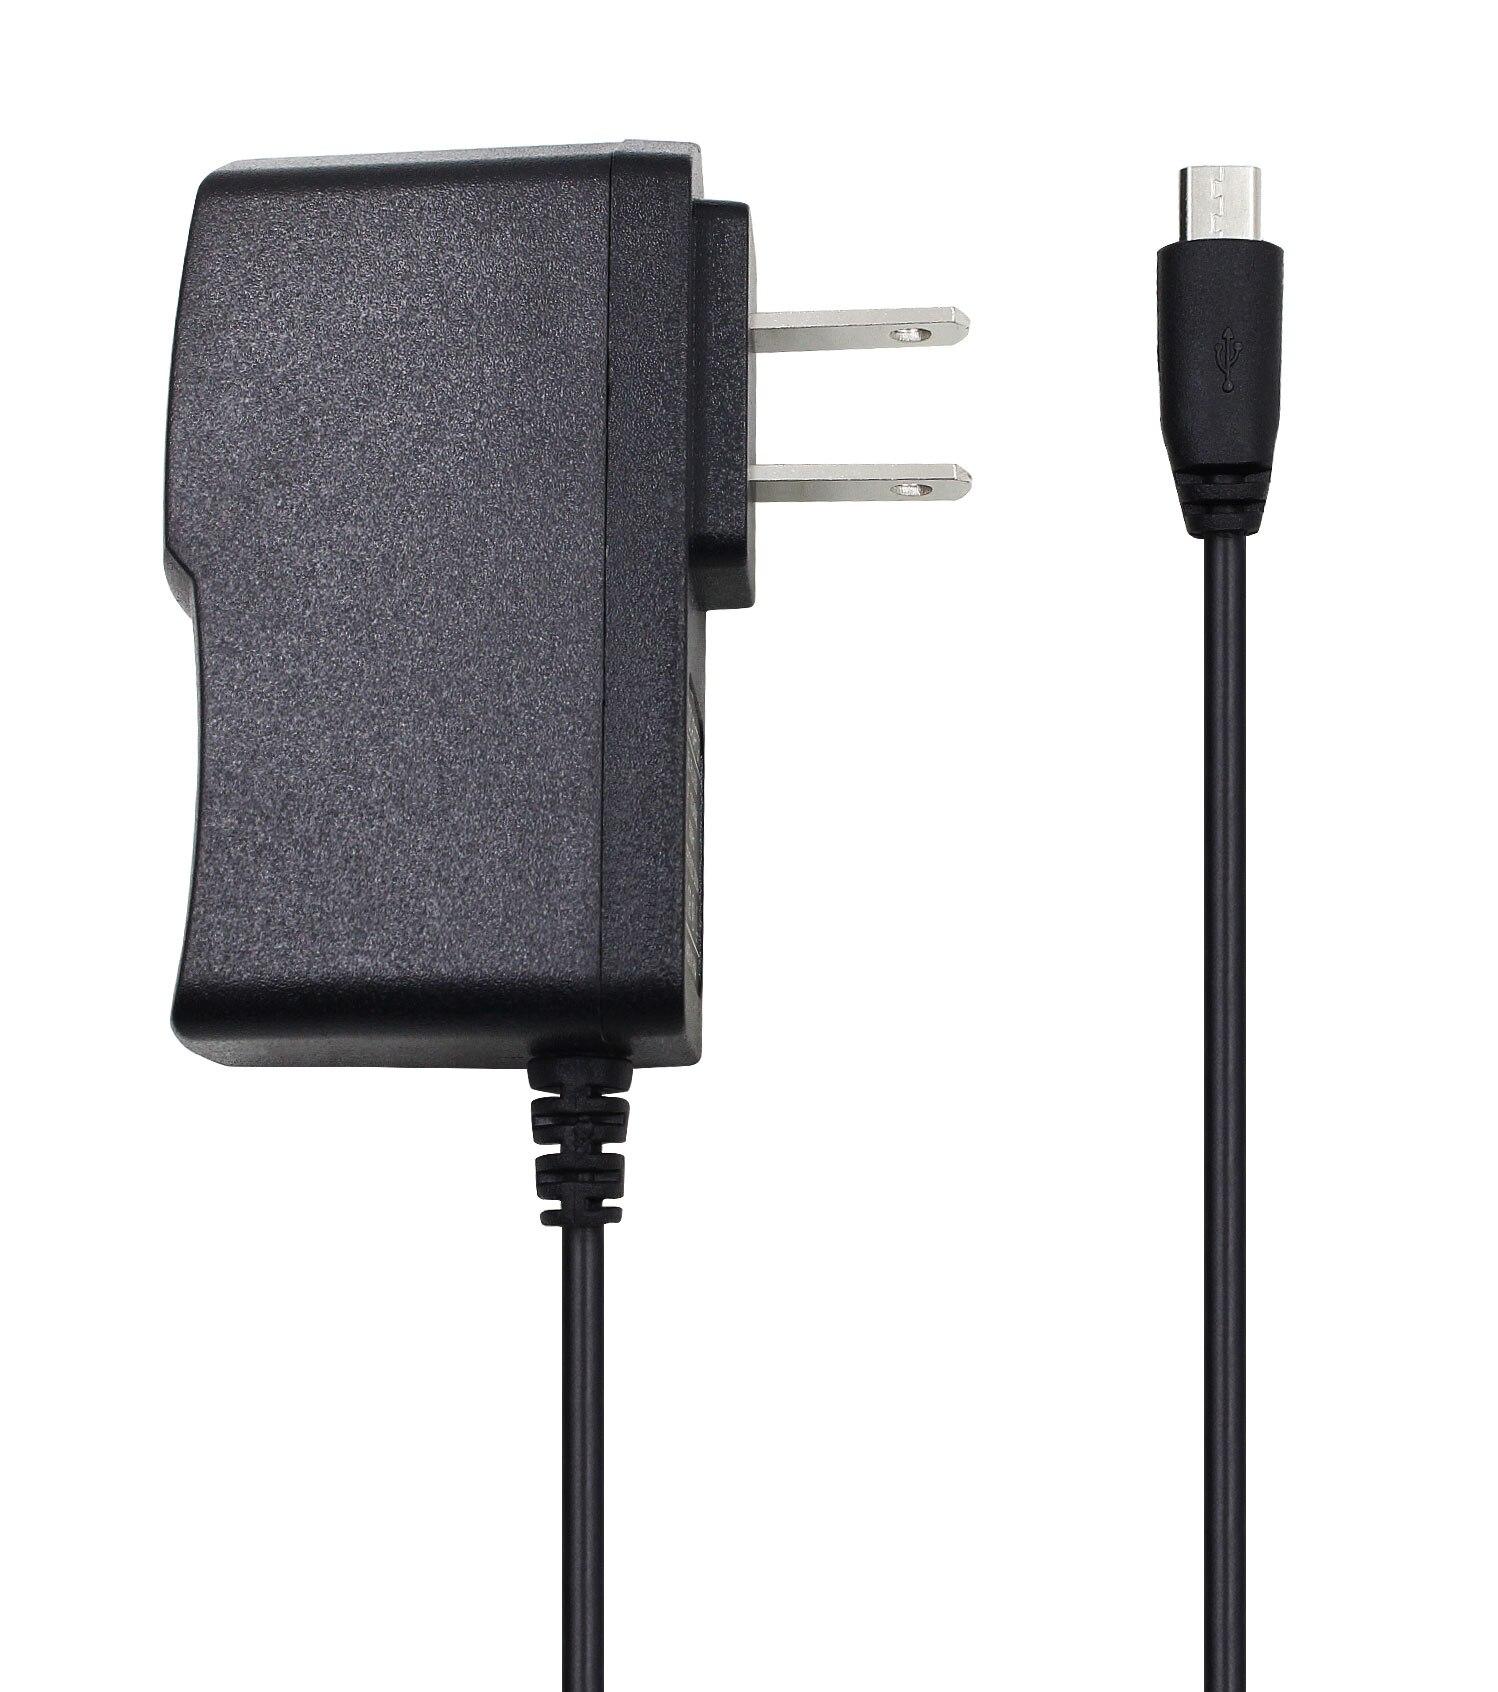 "Adaptador de CA/CC Cable de cargador de pared para LeapFrog Epic 31576, 31577 tableta 7"""